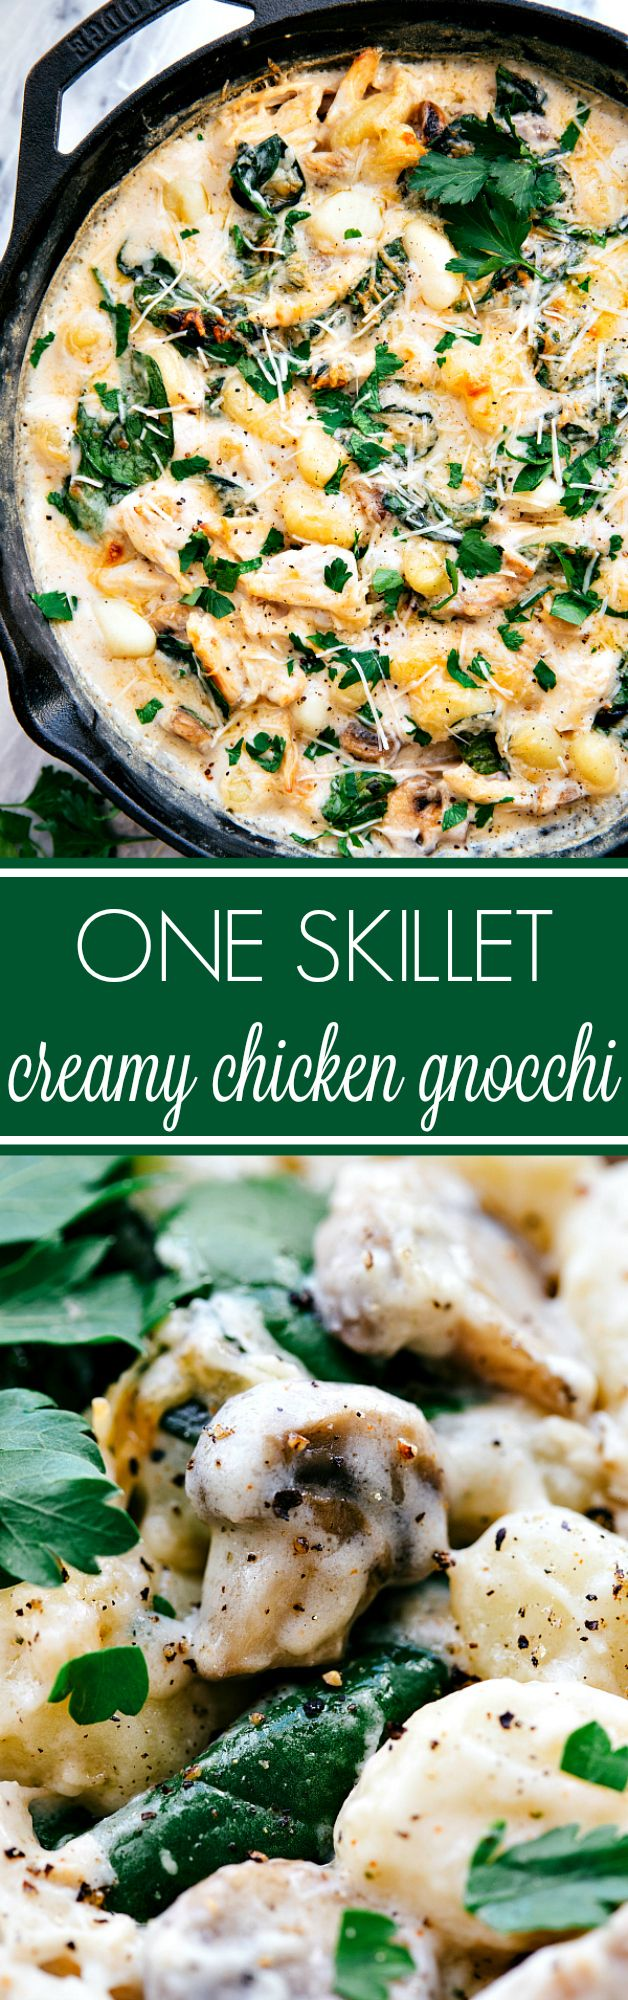 Easy 20 minute prep ONE SKILLET creamy chicken gnocchi